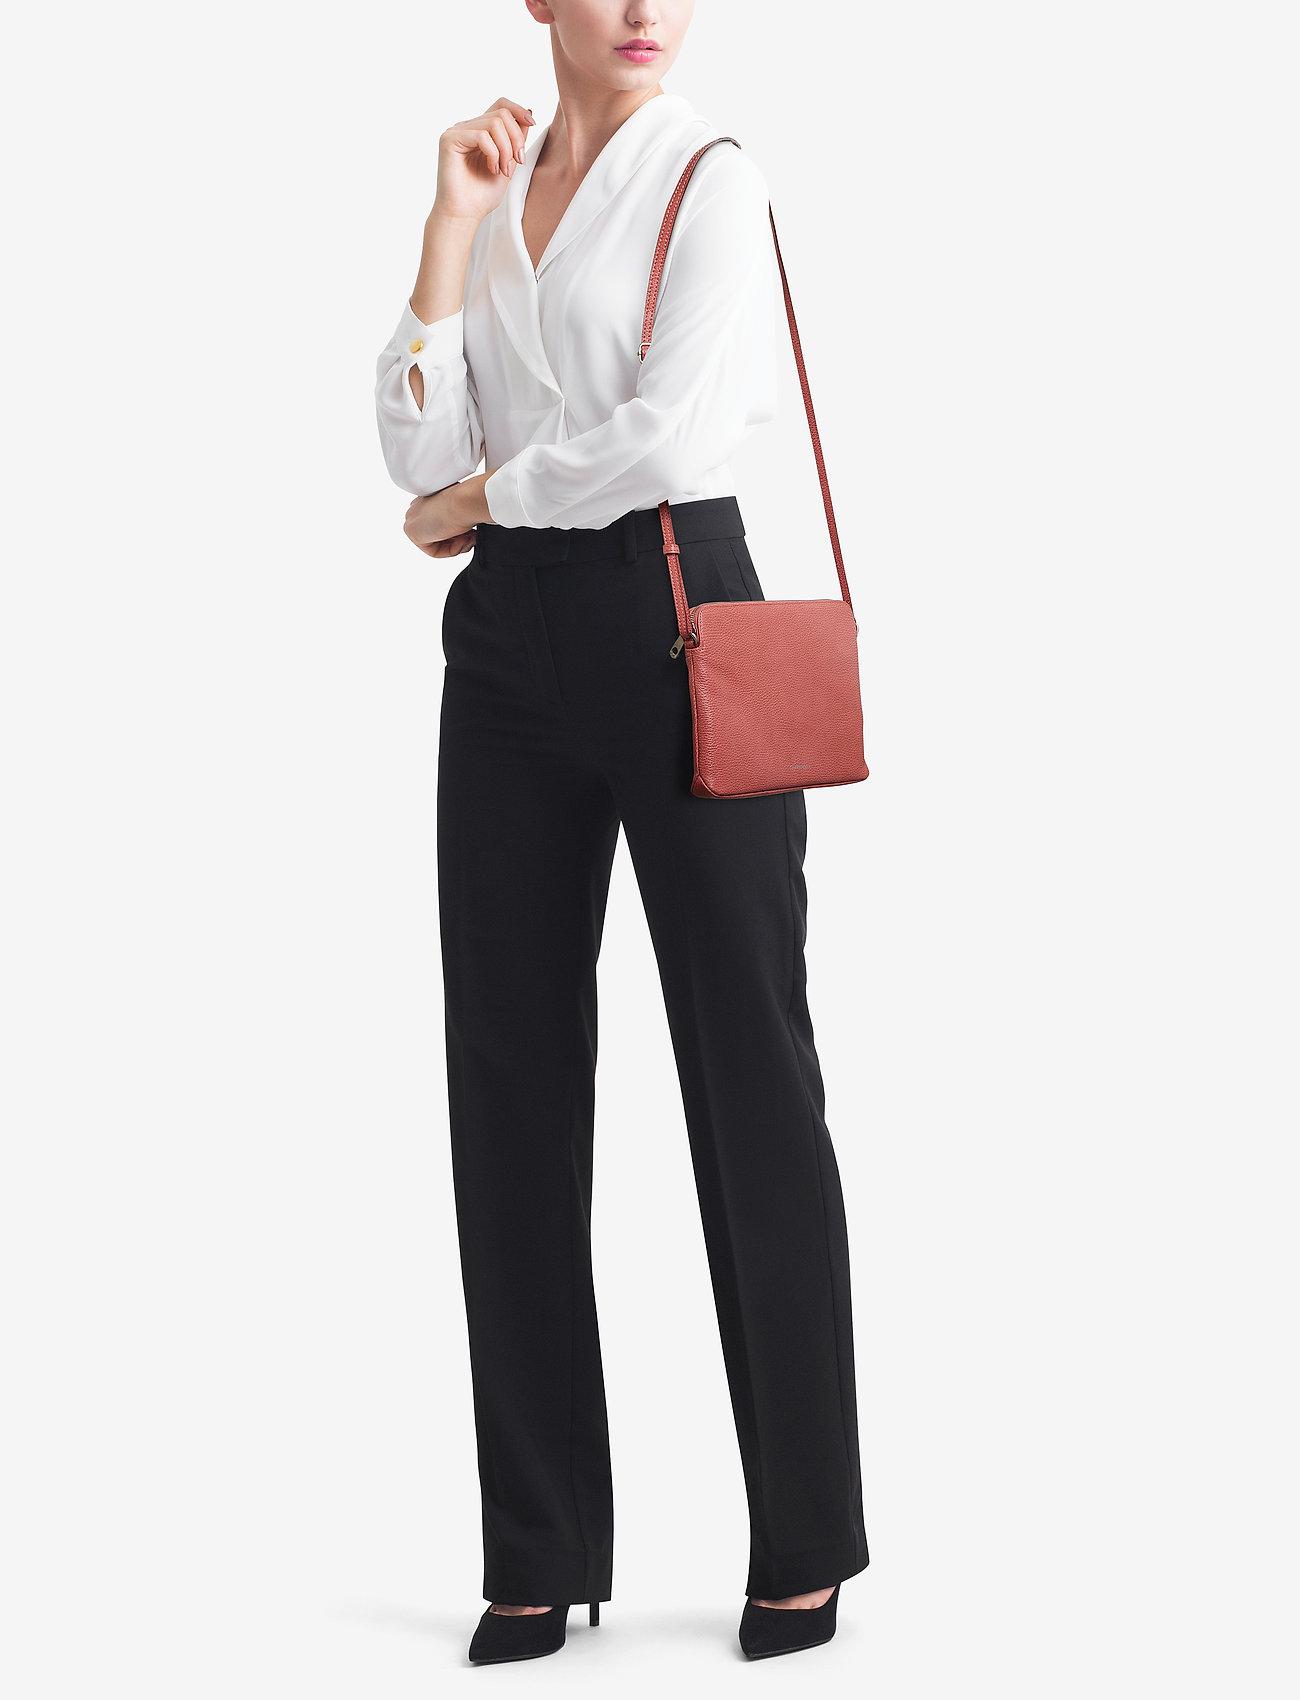 GiGi Fratelli Romance Flat bag - OLD ROSE